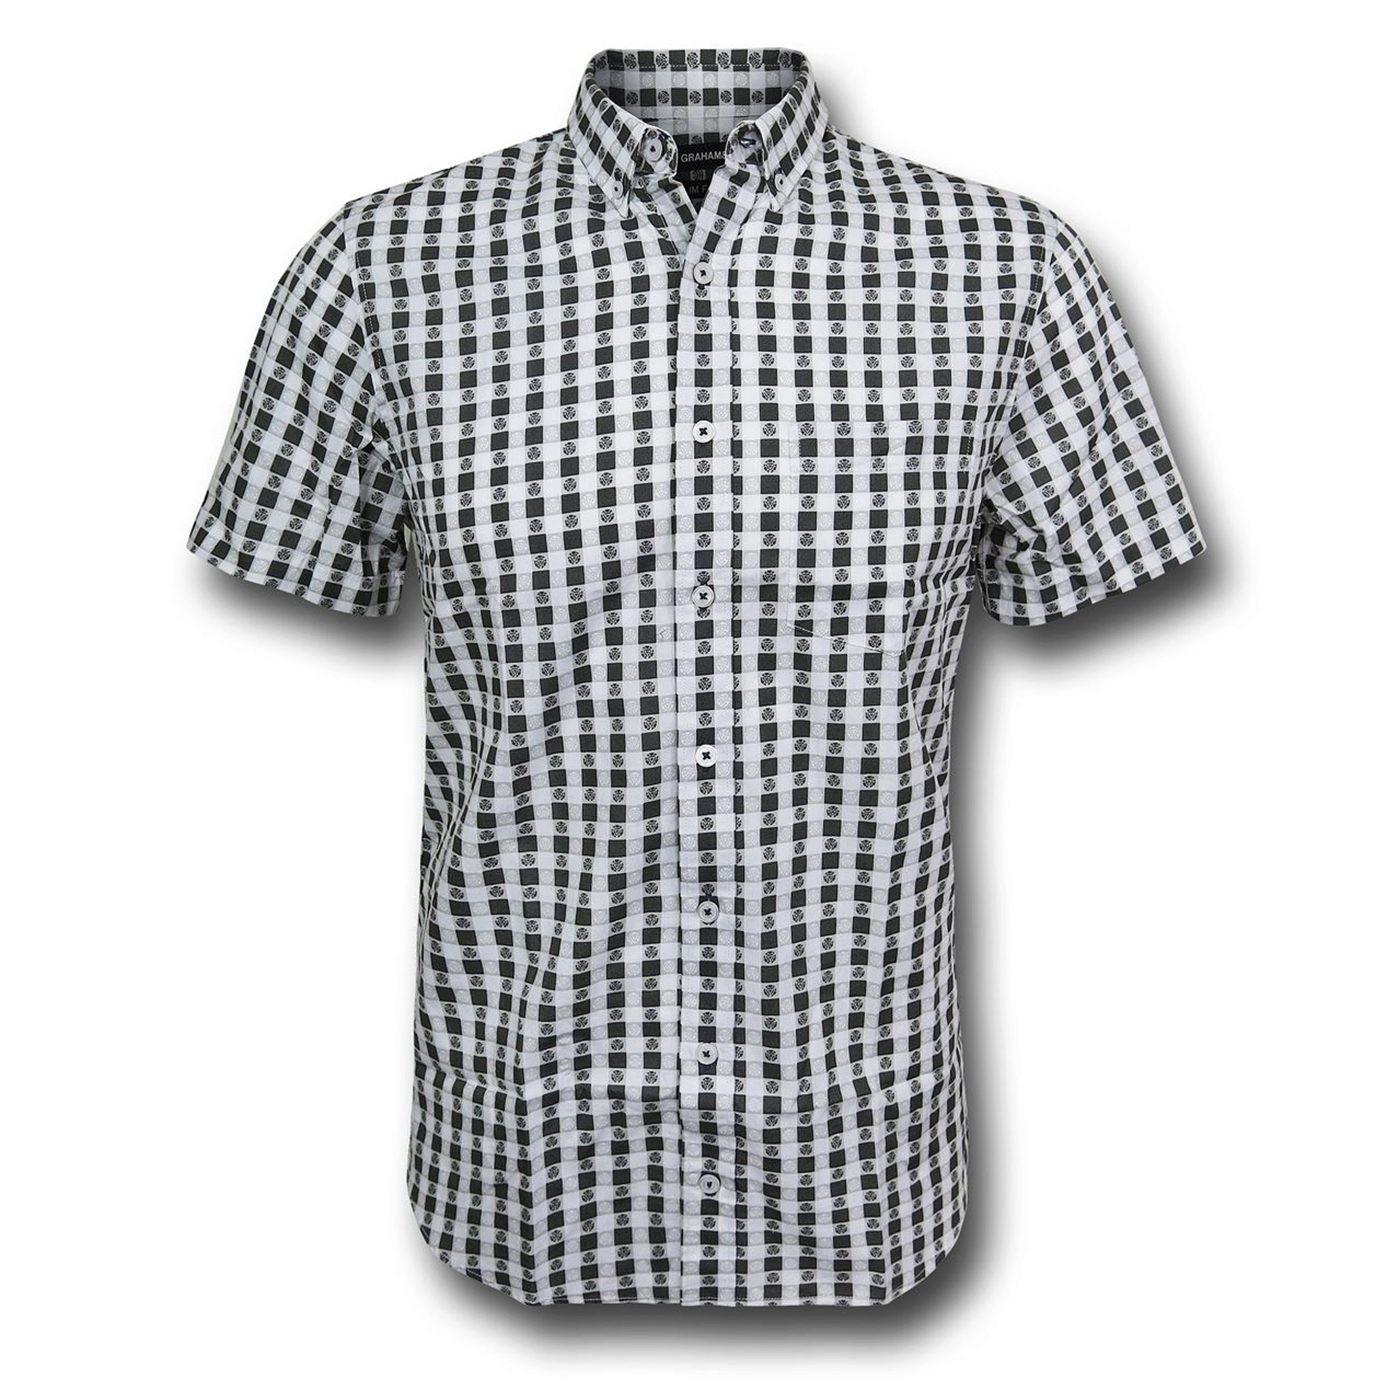 Iron Man Plaid Arc Symbol Men's Button Down Shirt